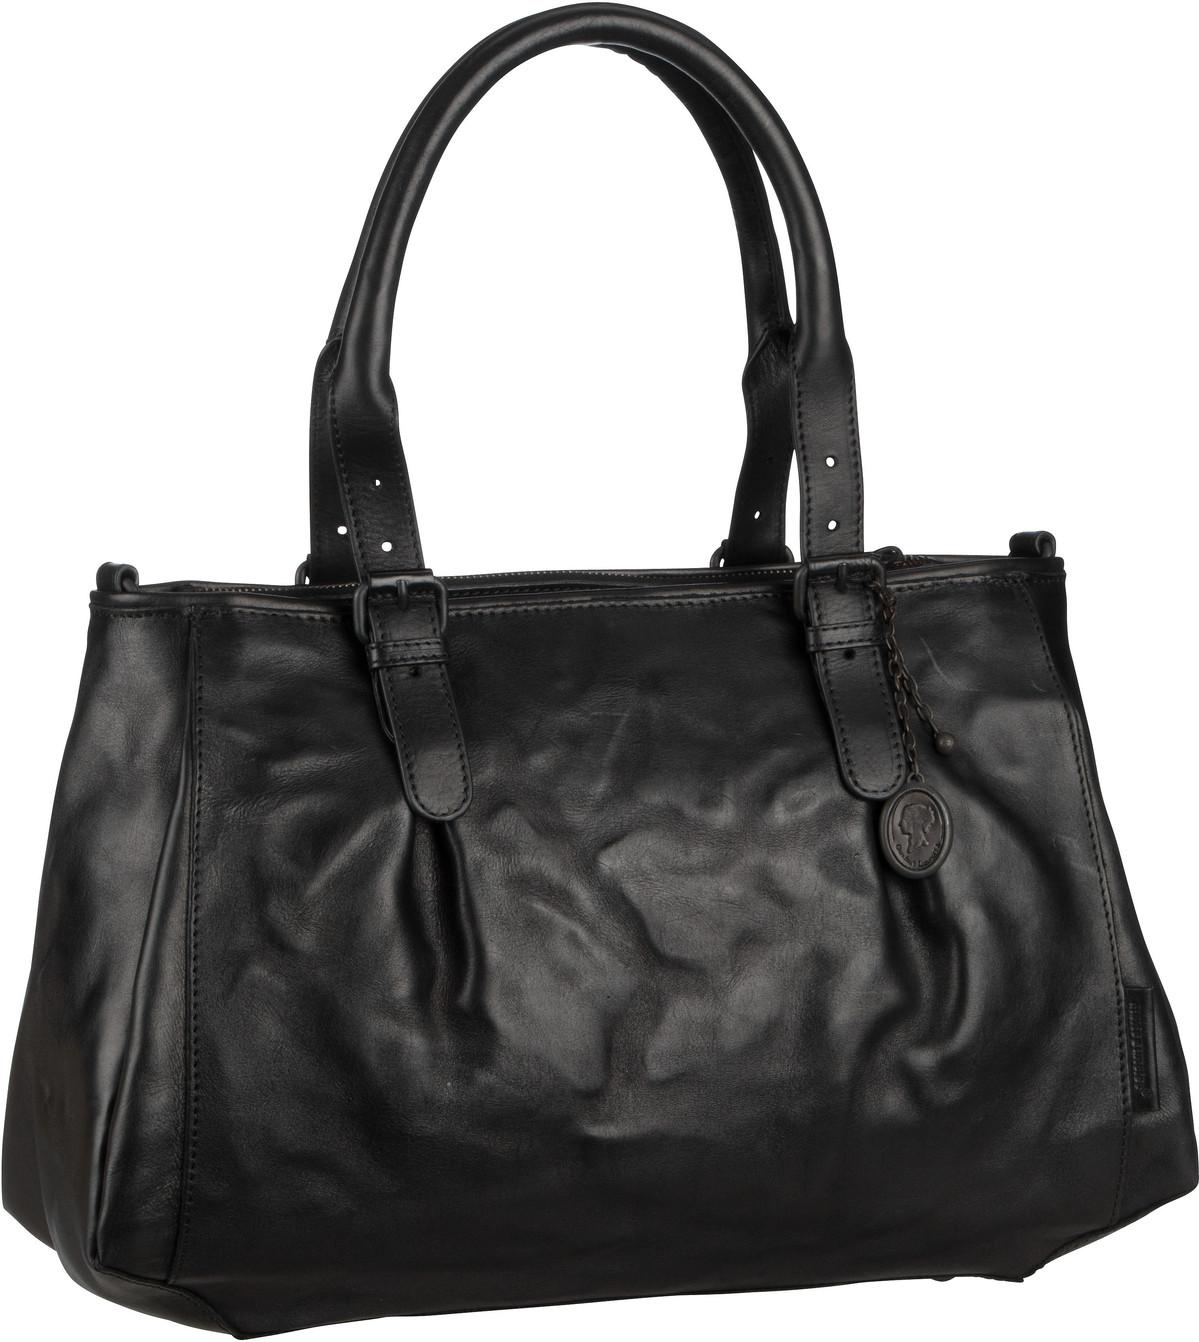 Handtasche Mrs. Shortbread Black